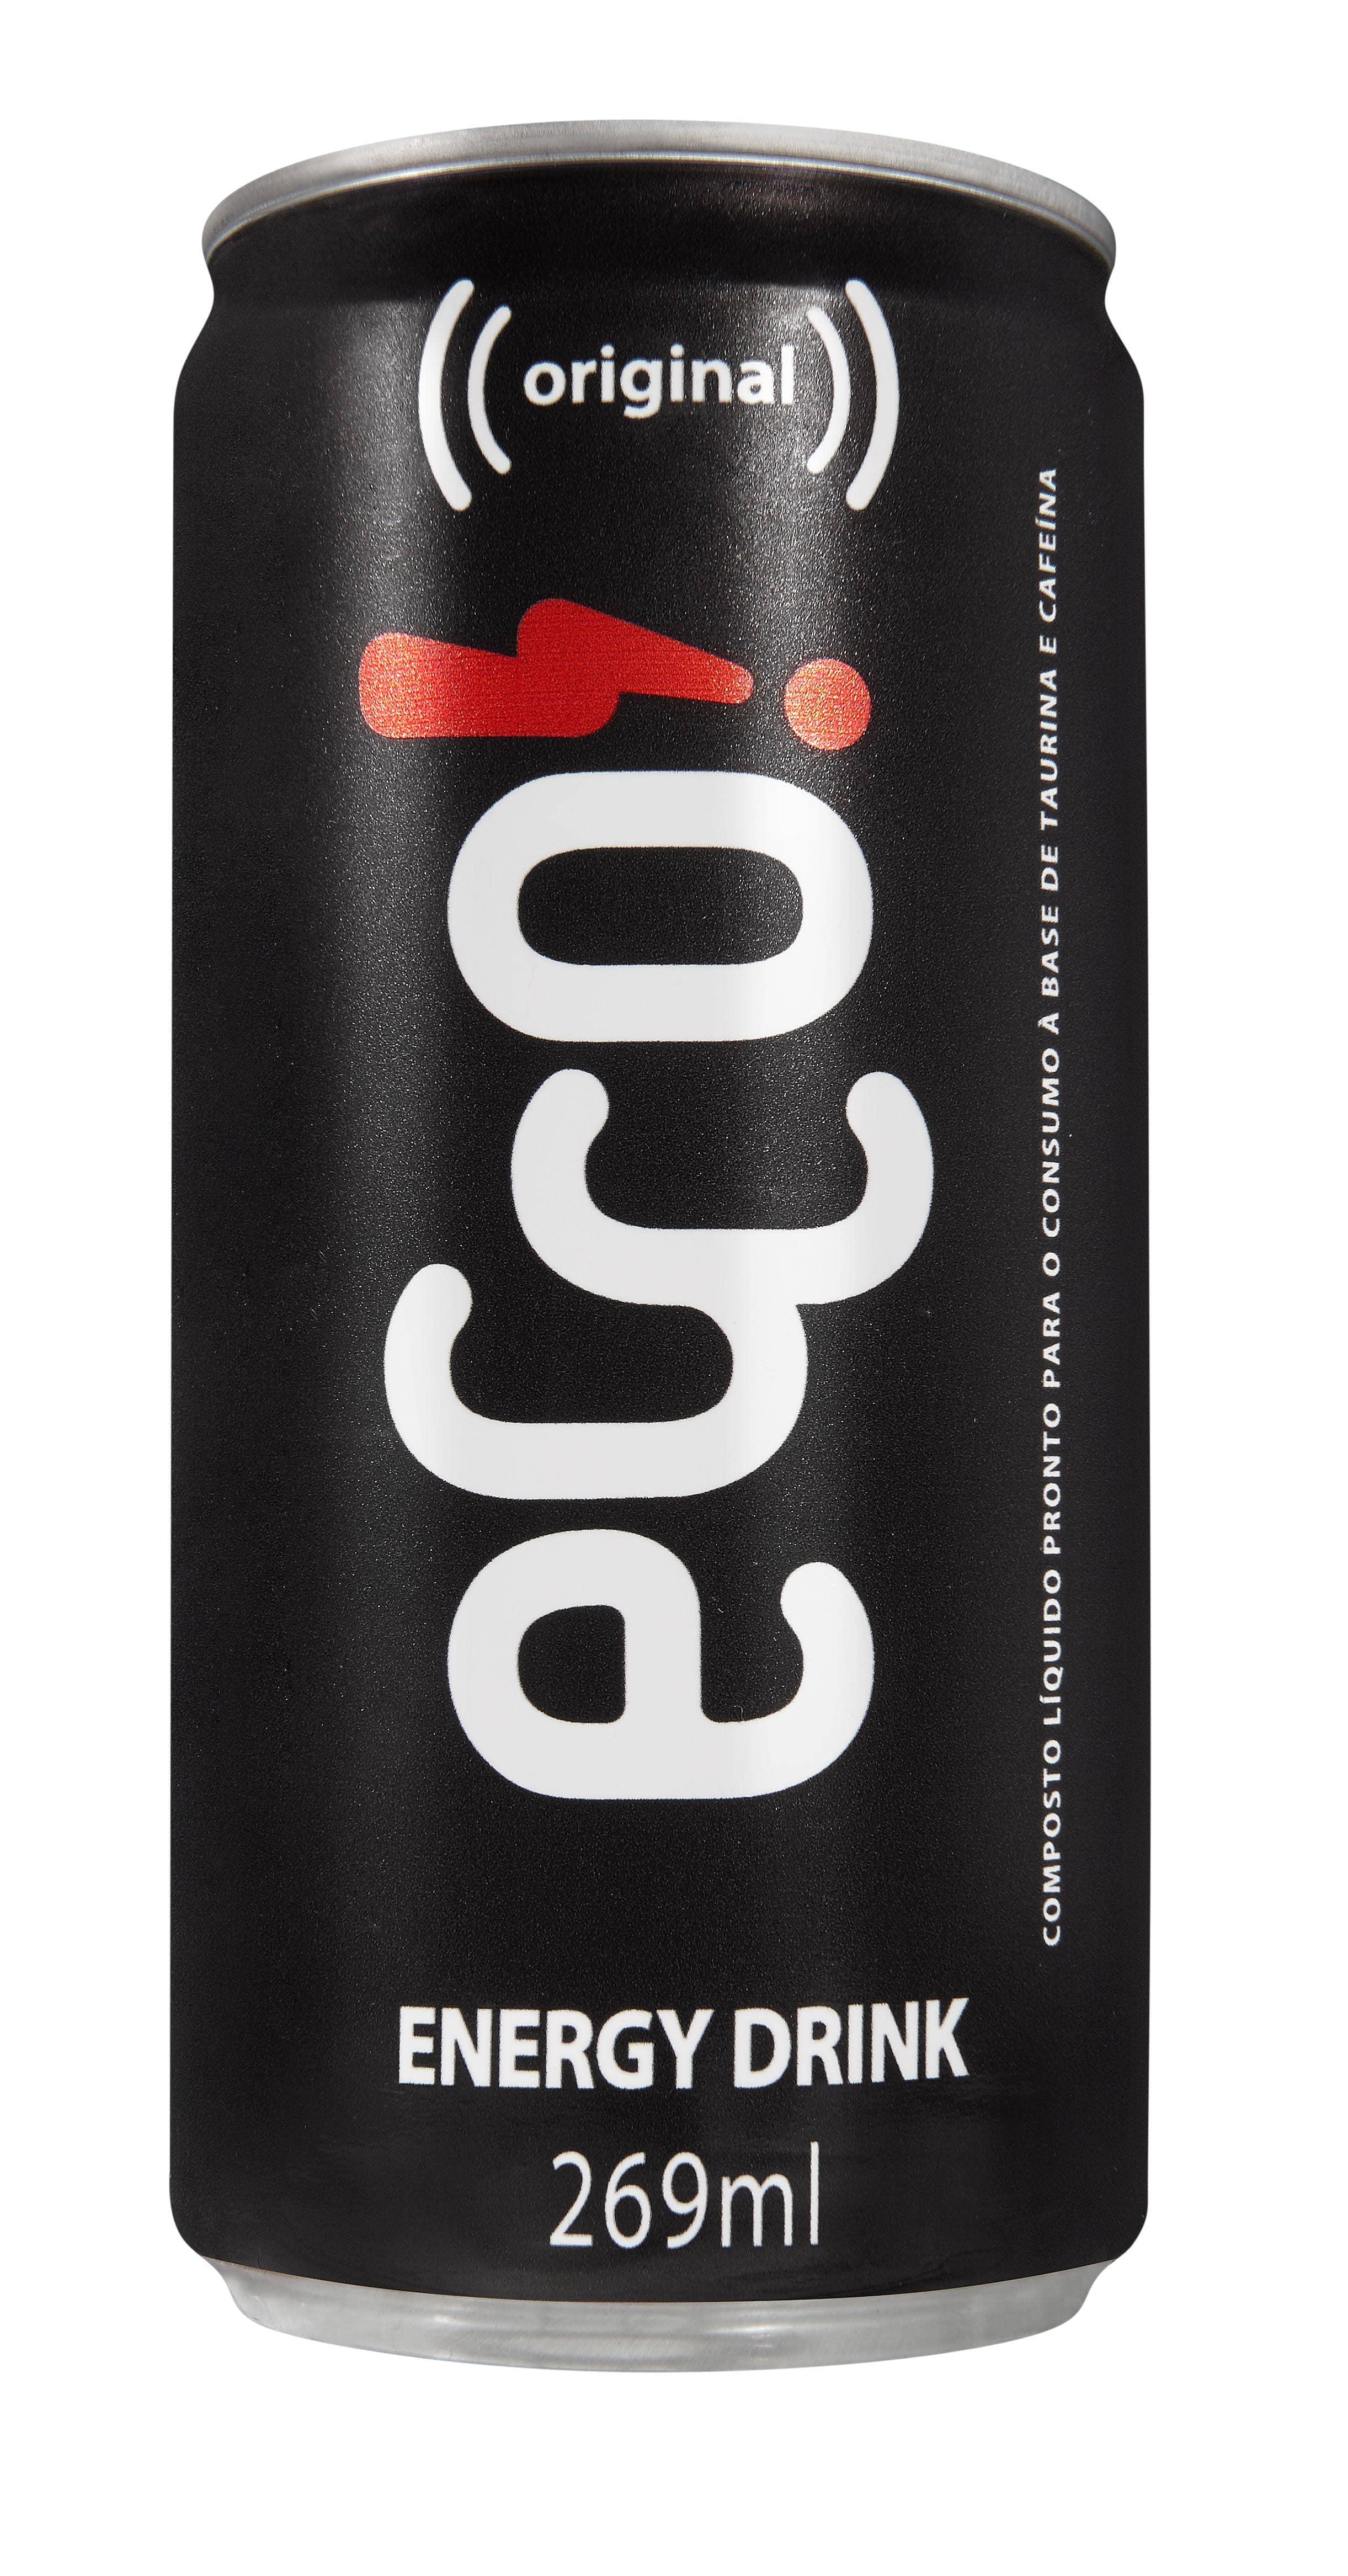 Ecco-Original_269ml